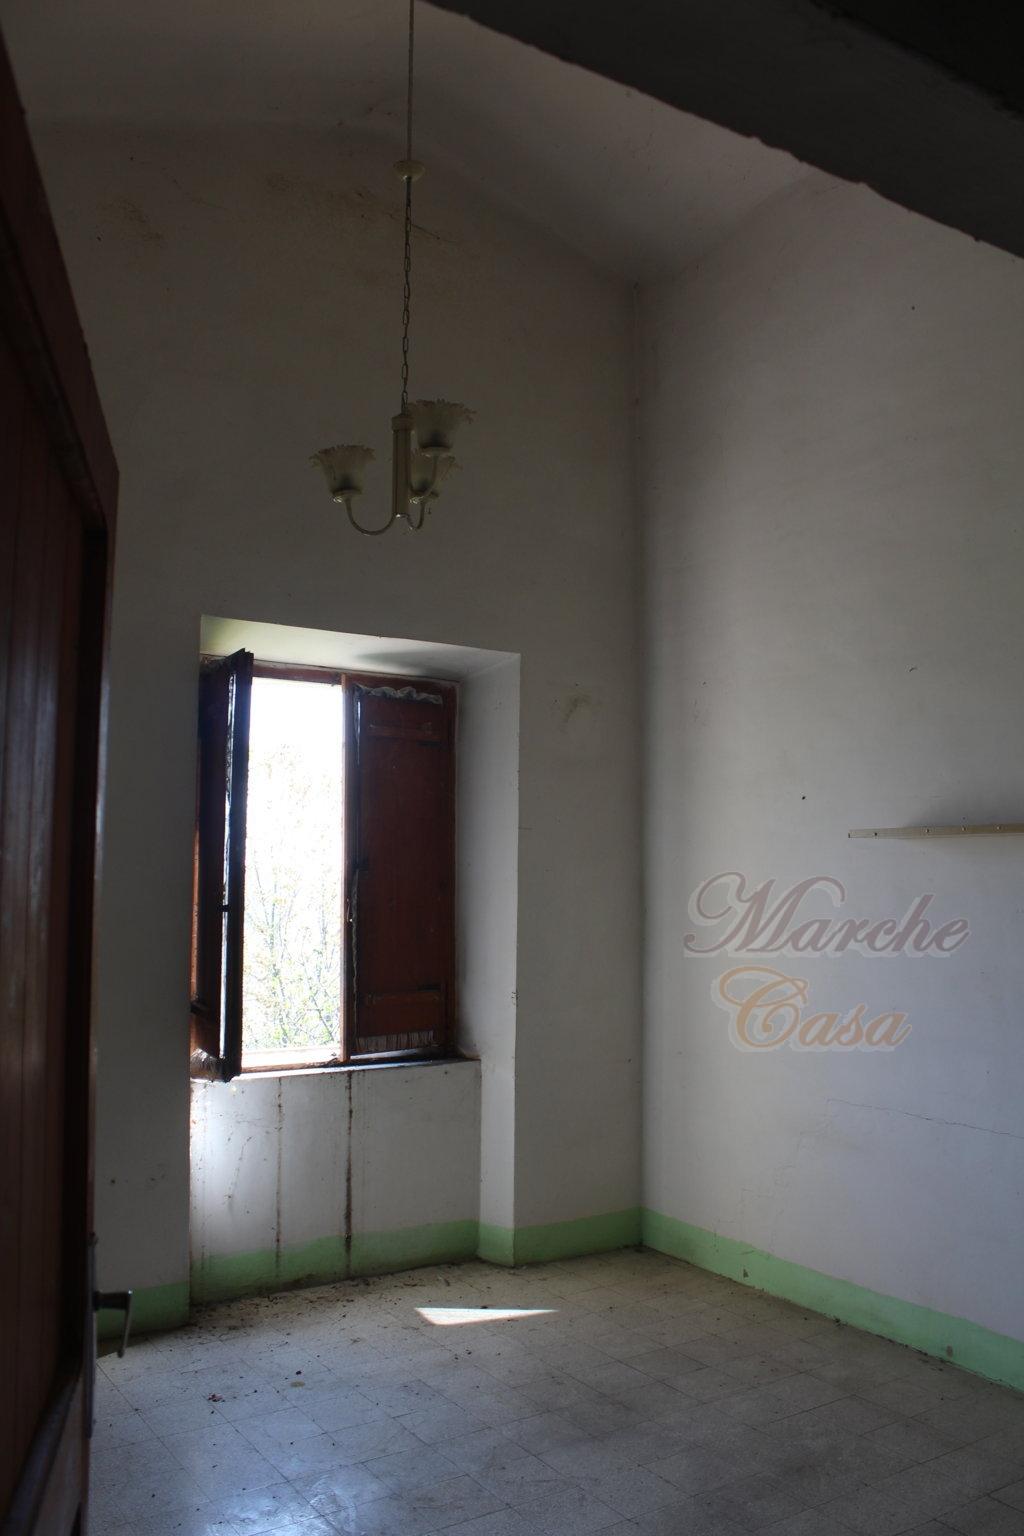 Marche casa CASALE COBALTO